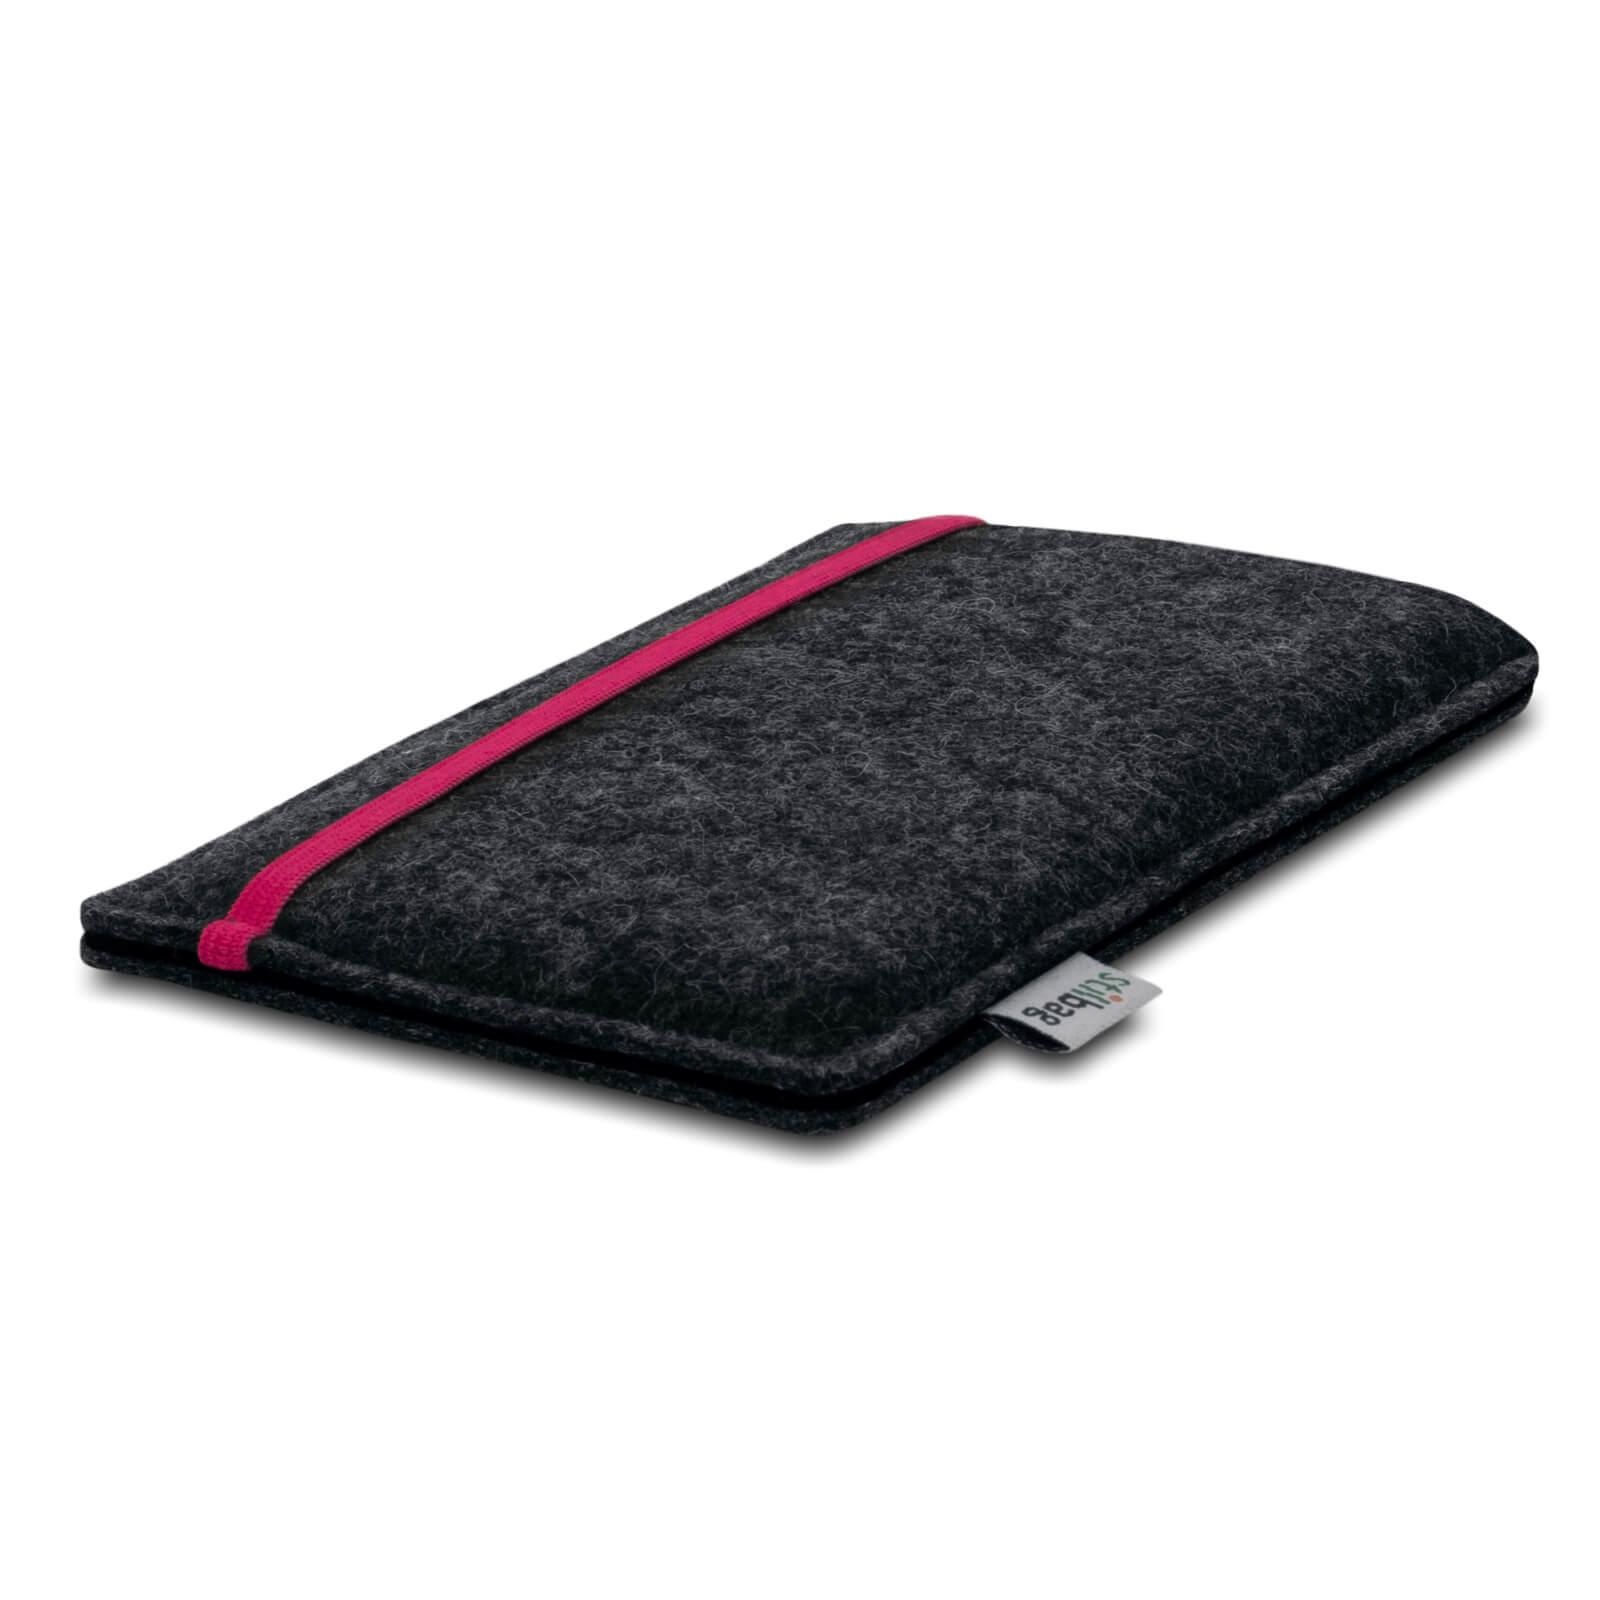 Stilbag-Feutre-Housse-mobile-Pochette-Etui-LEON-HTC-One-mini-2-anthracite